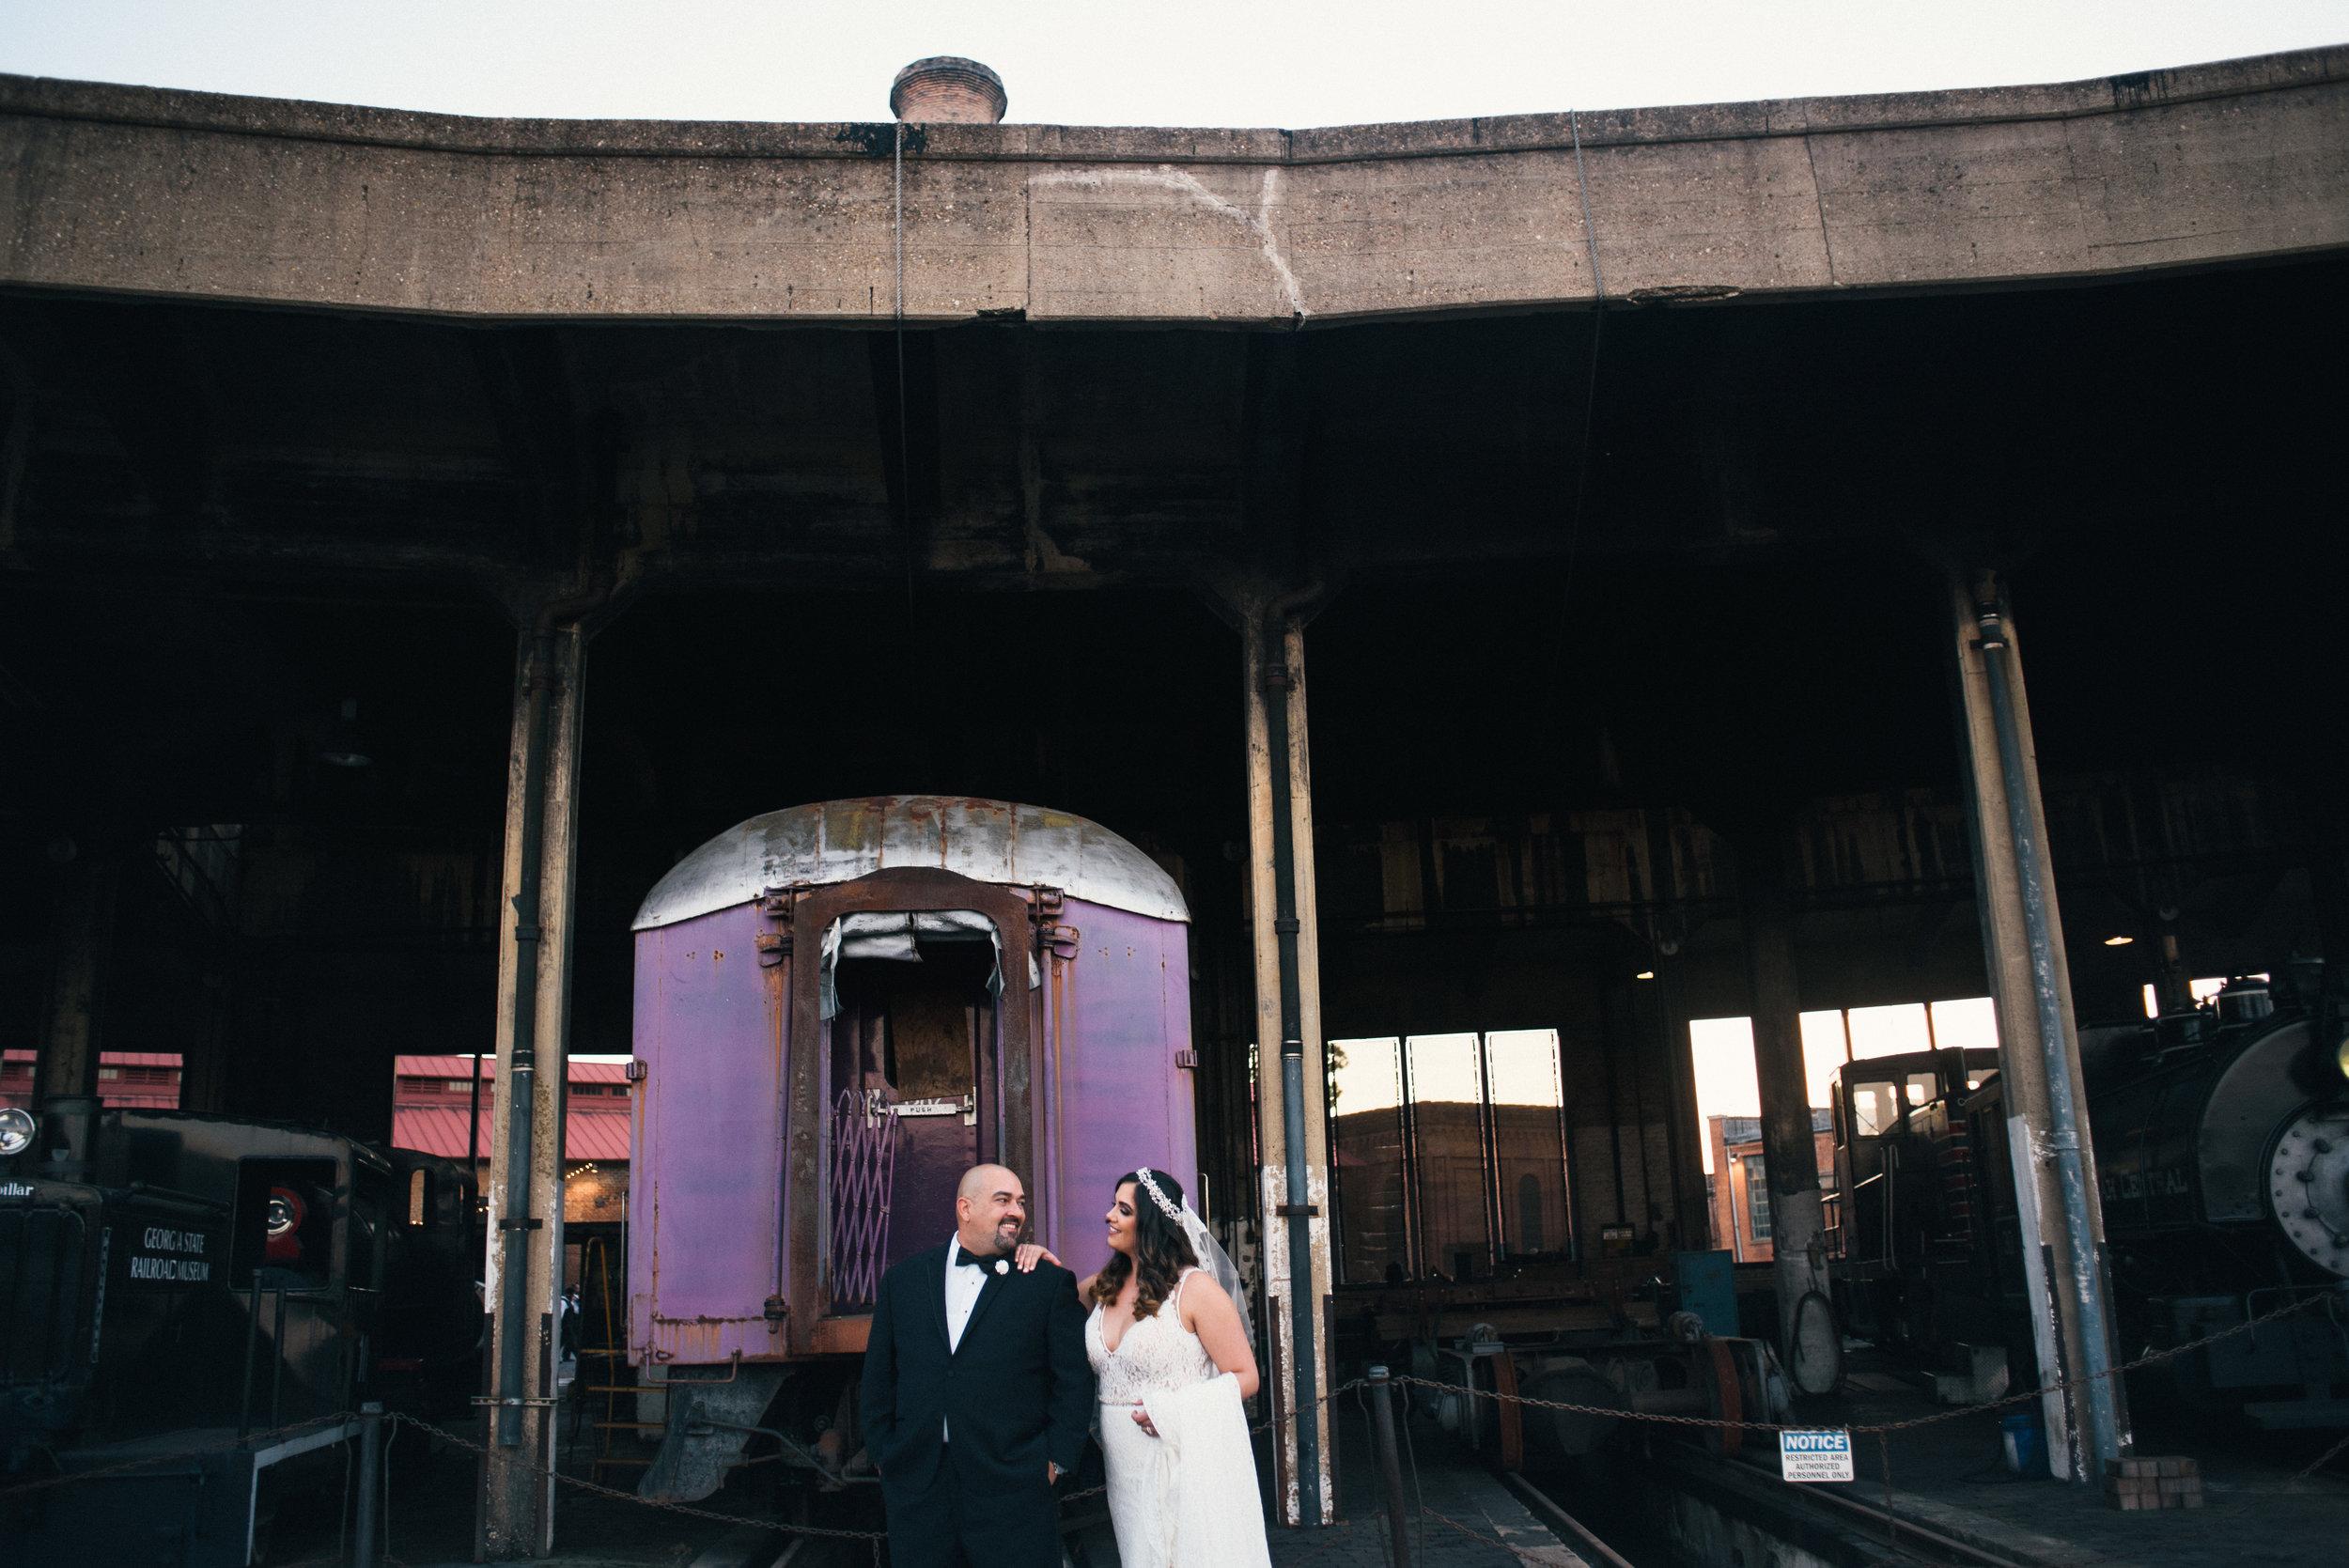 Iggy-and-yesenia-savannah-railroad-museum-wedding-meg-hill-photo- (745 of 1037).jpg